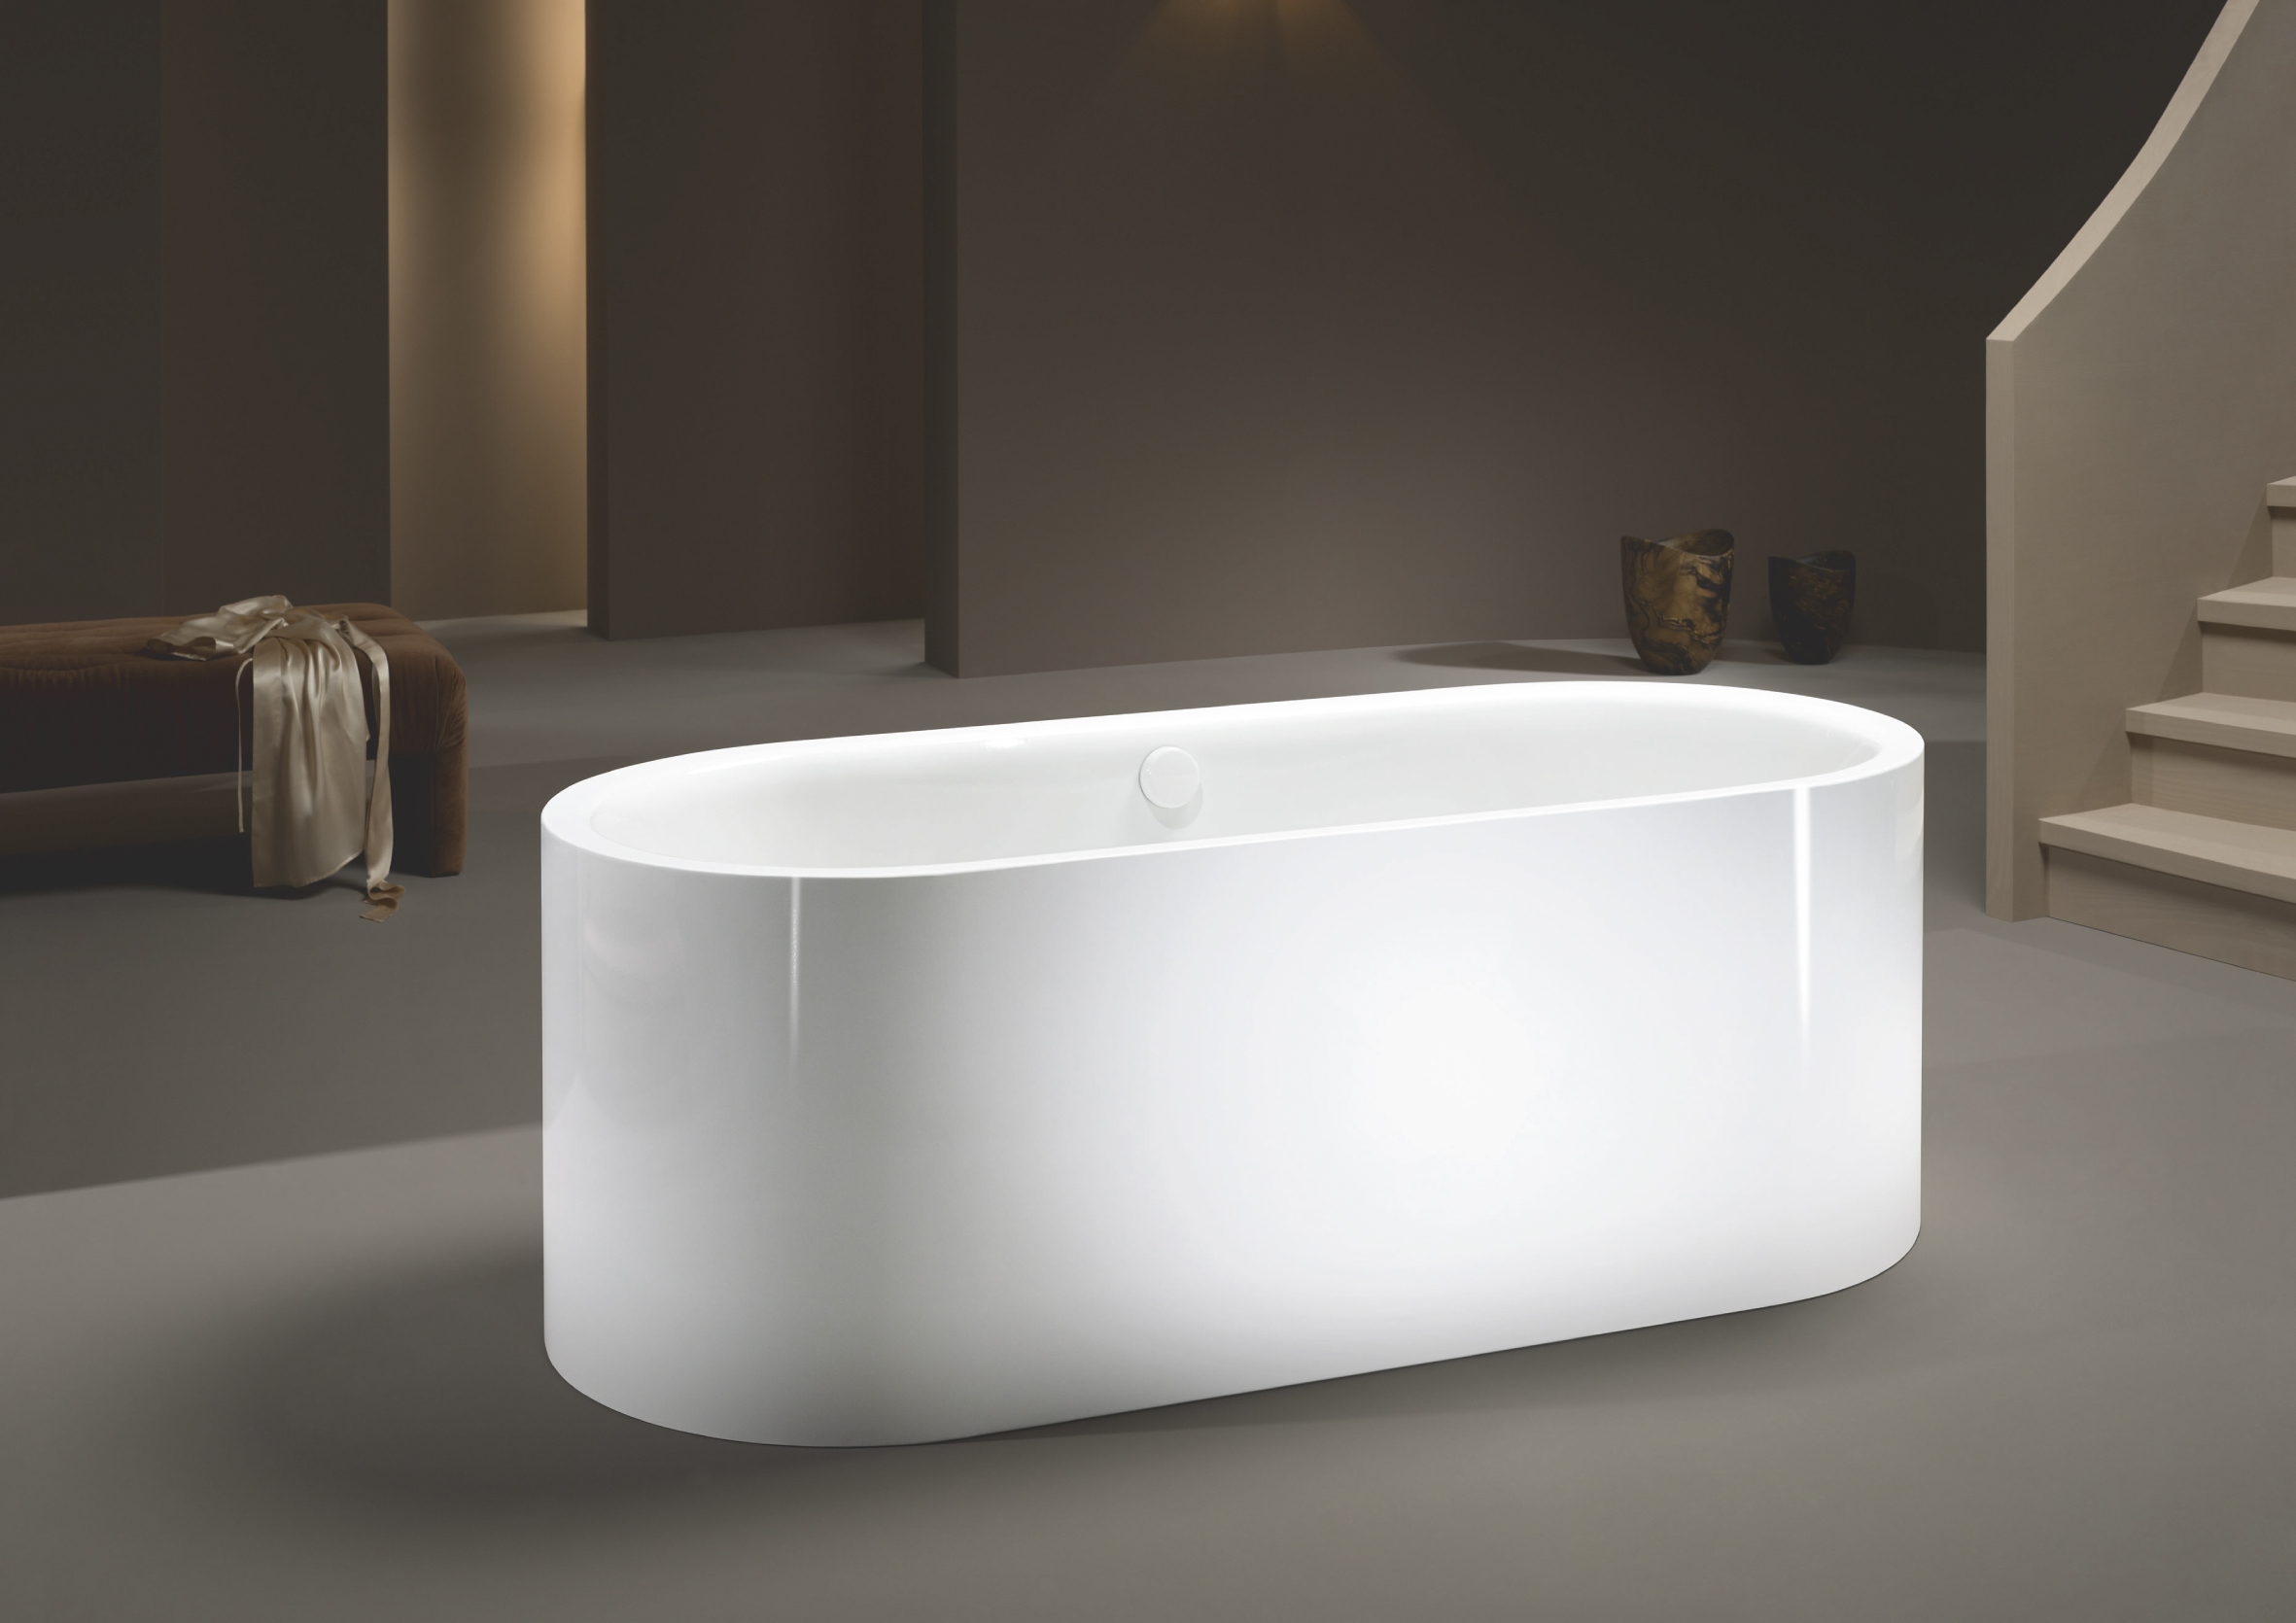 kaldewei kaldewei presents new meisterst cke range iconic bathroom solutions. Black Bedroom Furniture Sets. Home Design Ideas